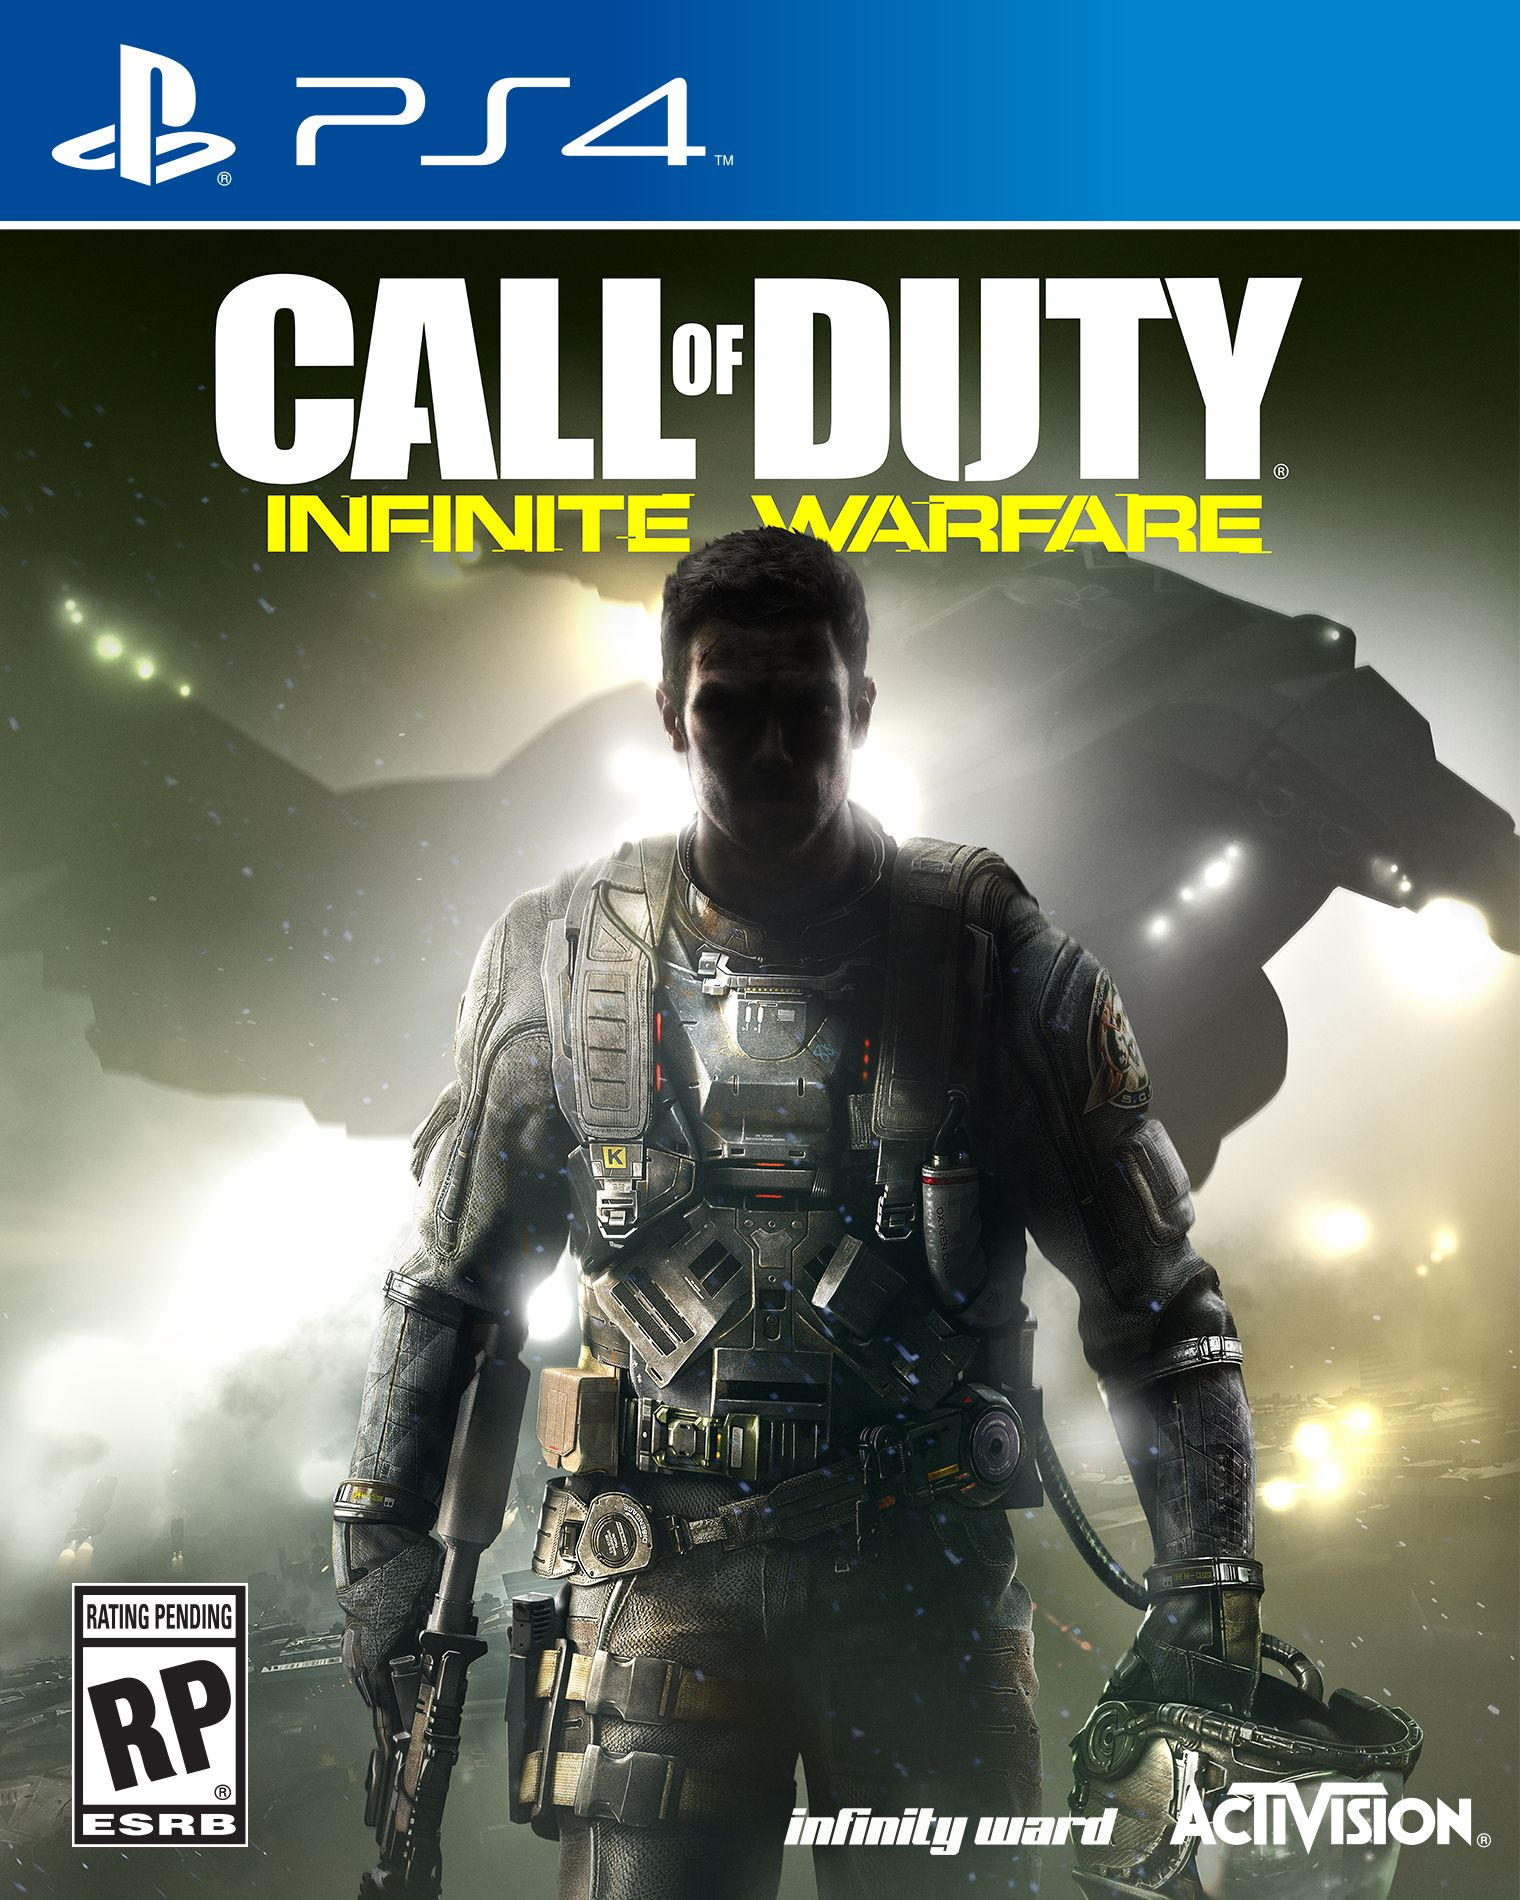 call-of-duty-infinite-warfare_pc-4859.jp